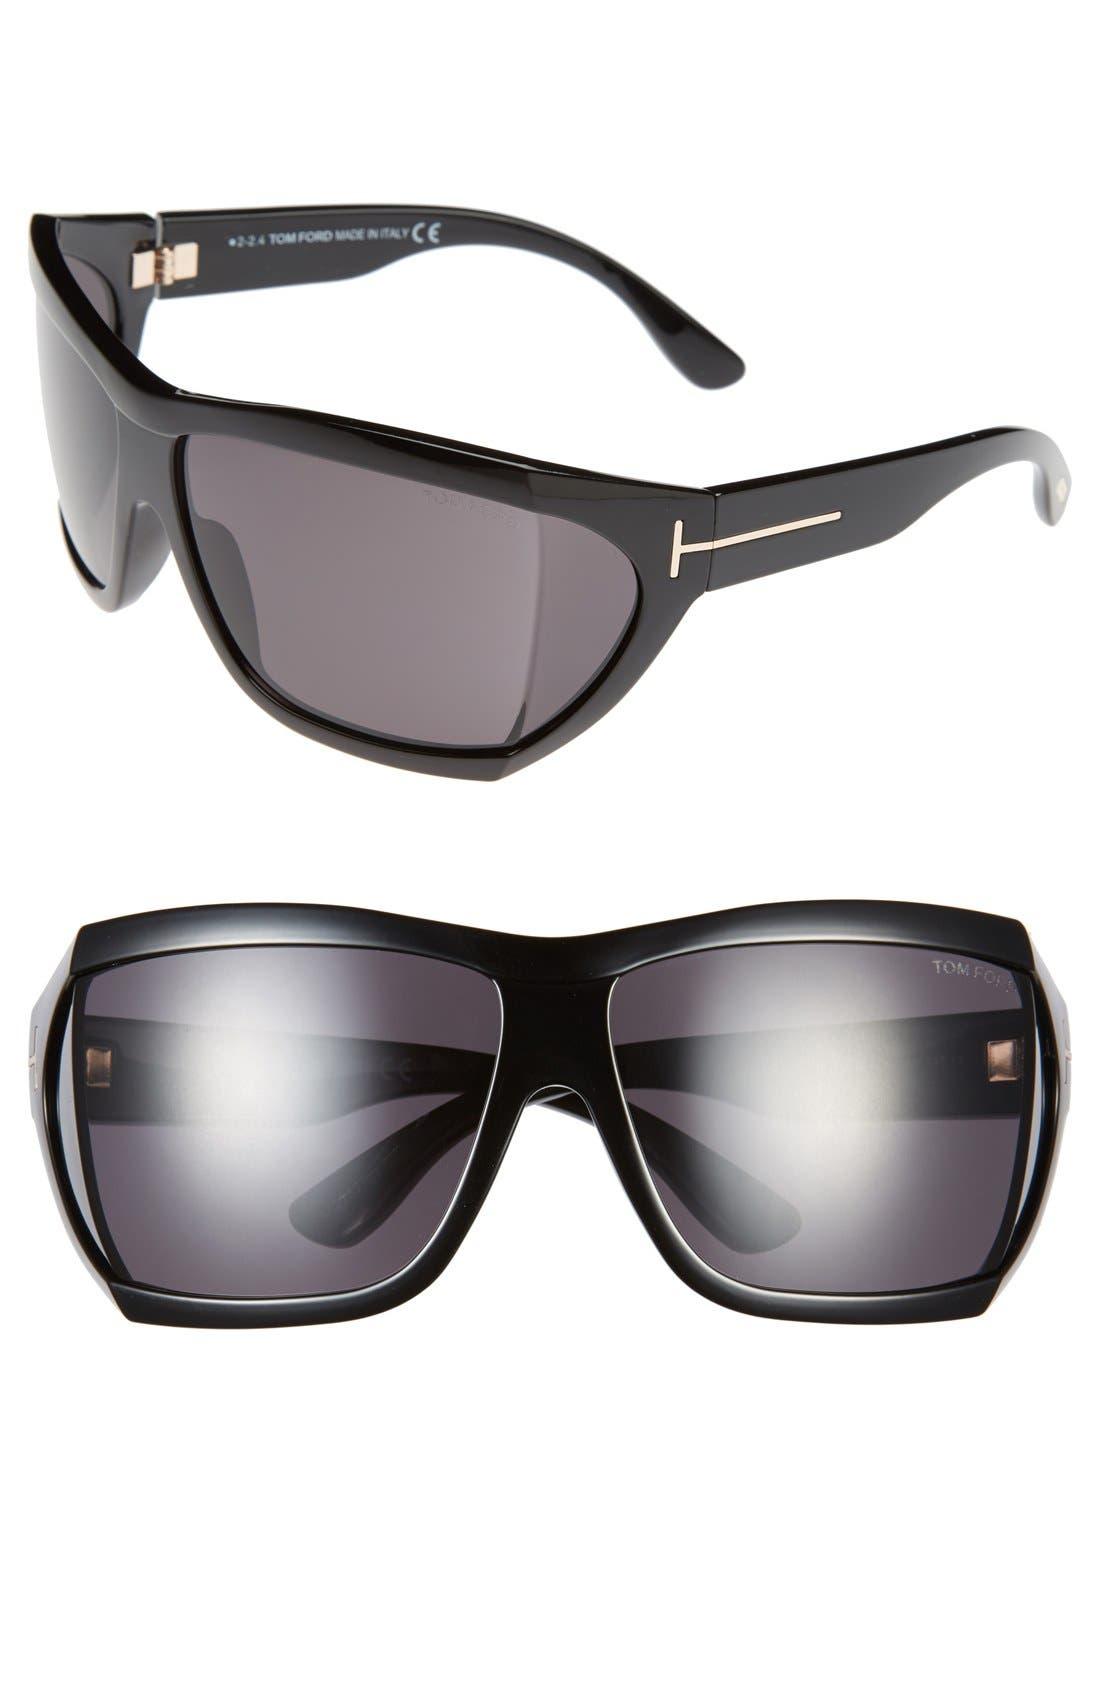 TOM FORD 'Sedgewick' 62mm Sunglasses, Main, color, 001